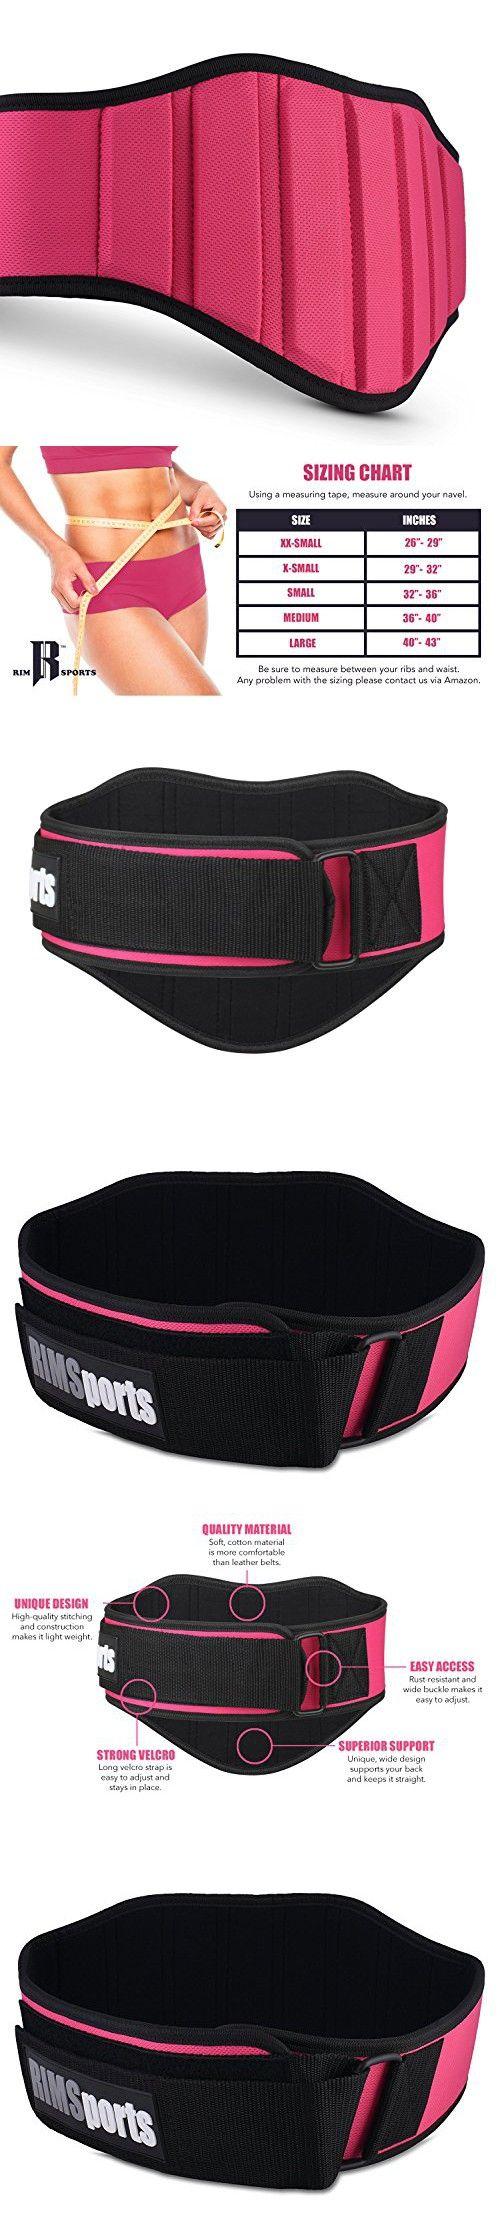 Premium Weightlifting Belts Women & Men - Ideal Squat Belt For Gym, & Squats - Best Belt Weightlifting For Lift Weights Equipment And Weights - Durable Belt Weight Lifting (Pink XS)